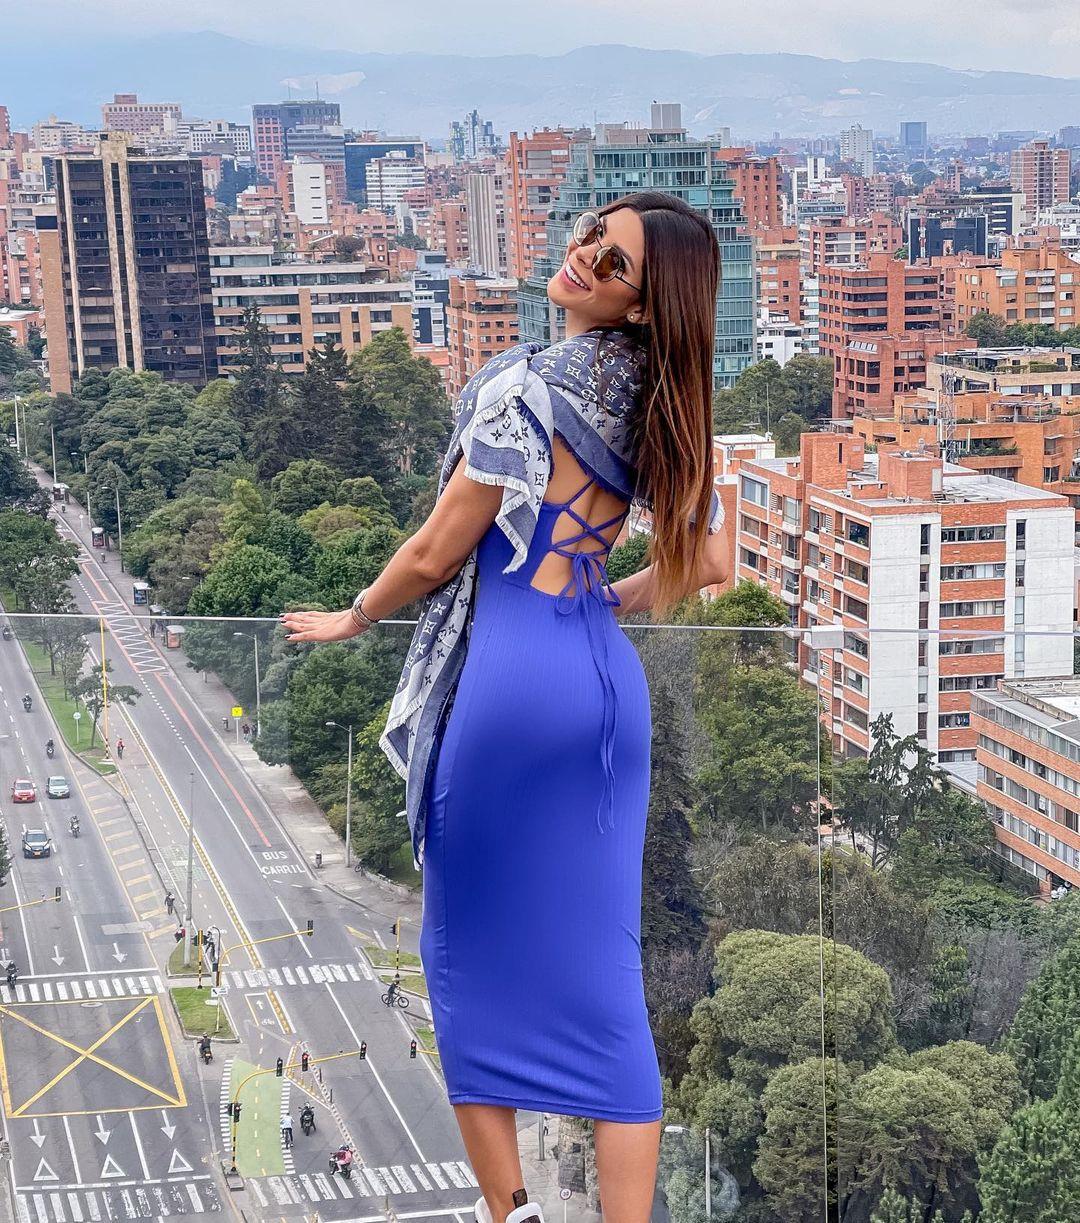 laura olascuaga, miss colombia universo 2020. - Página 12 Qvia7s10